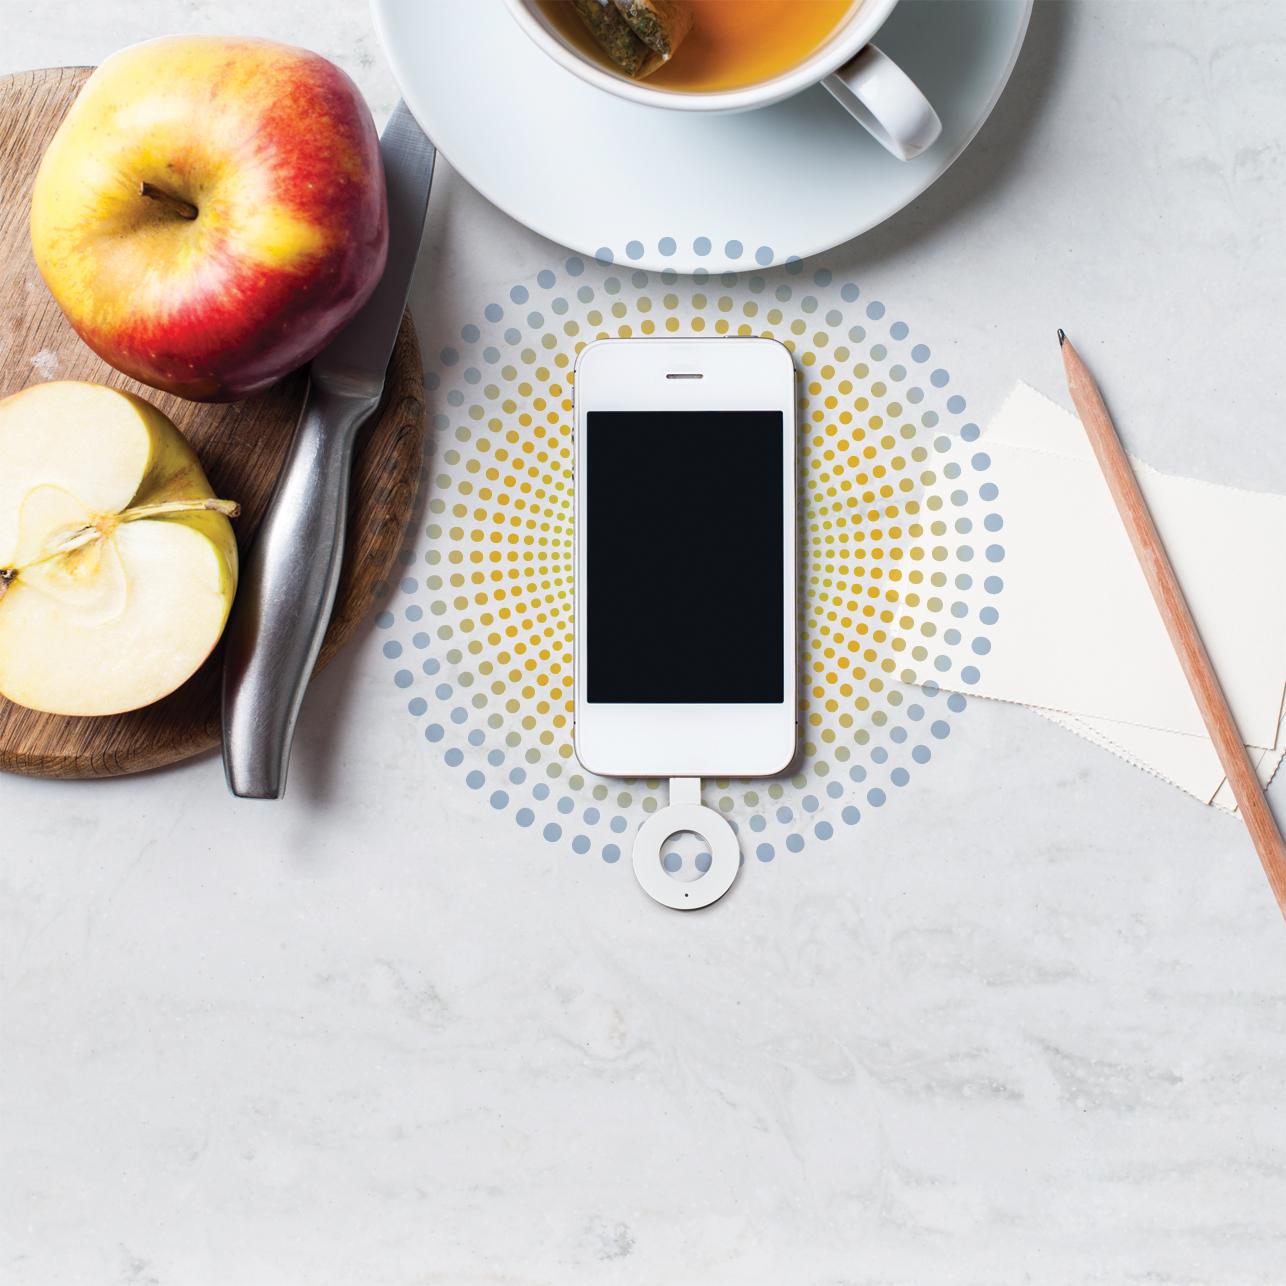 Plan De Travail Mobile corian® charging surfaces - bray & scarff appliance